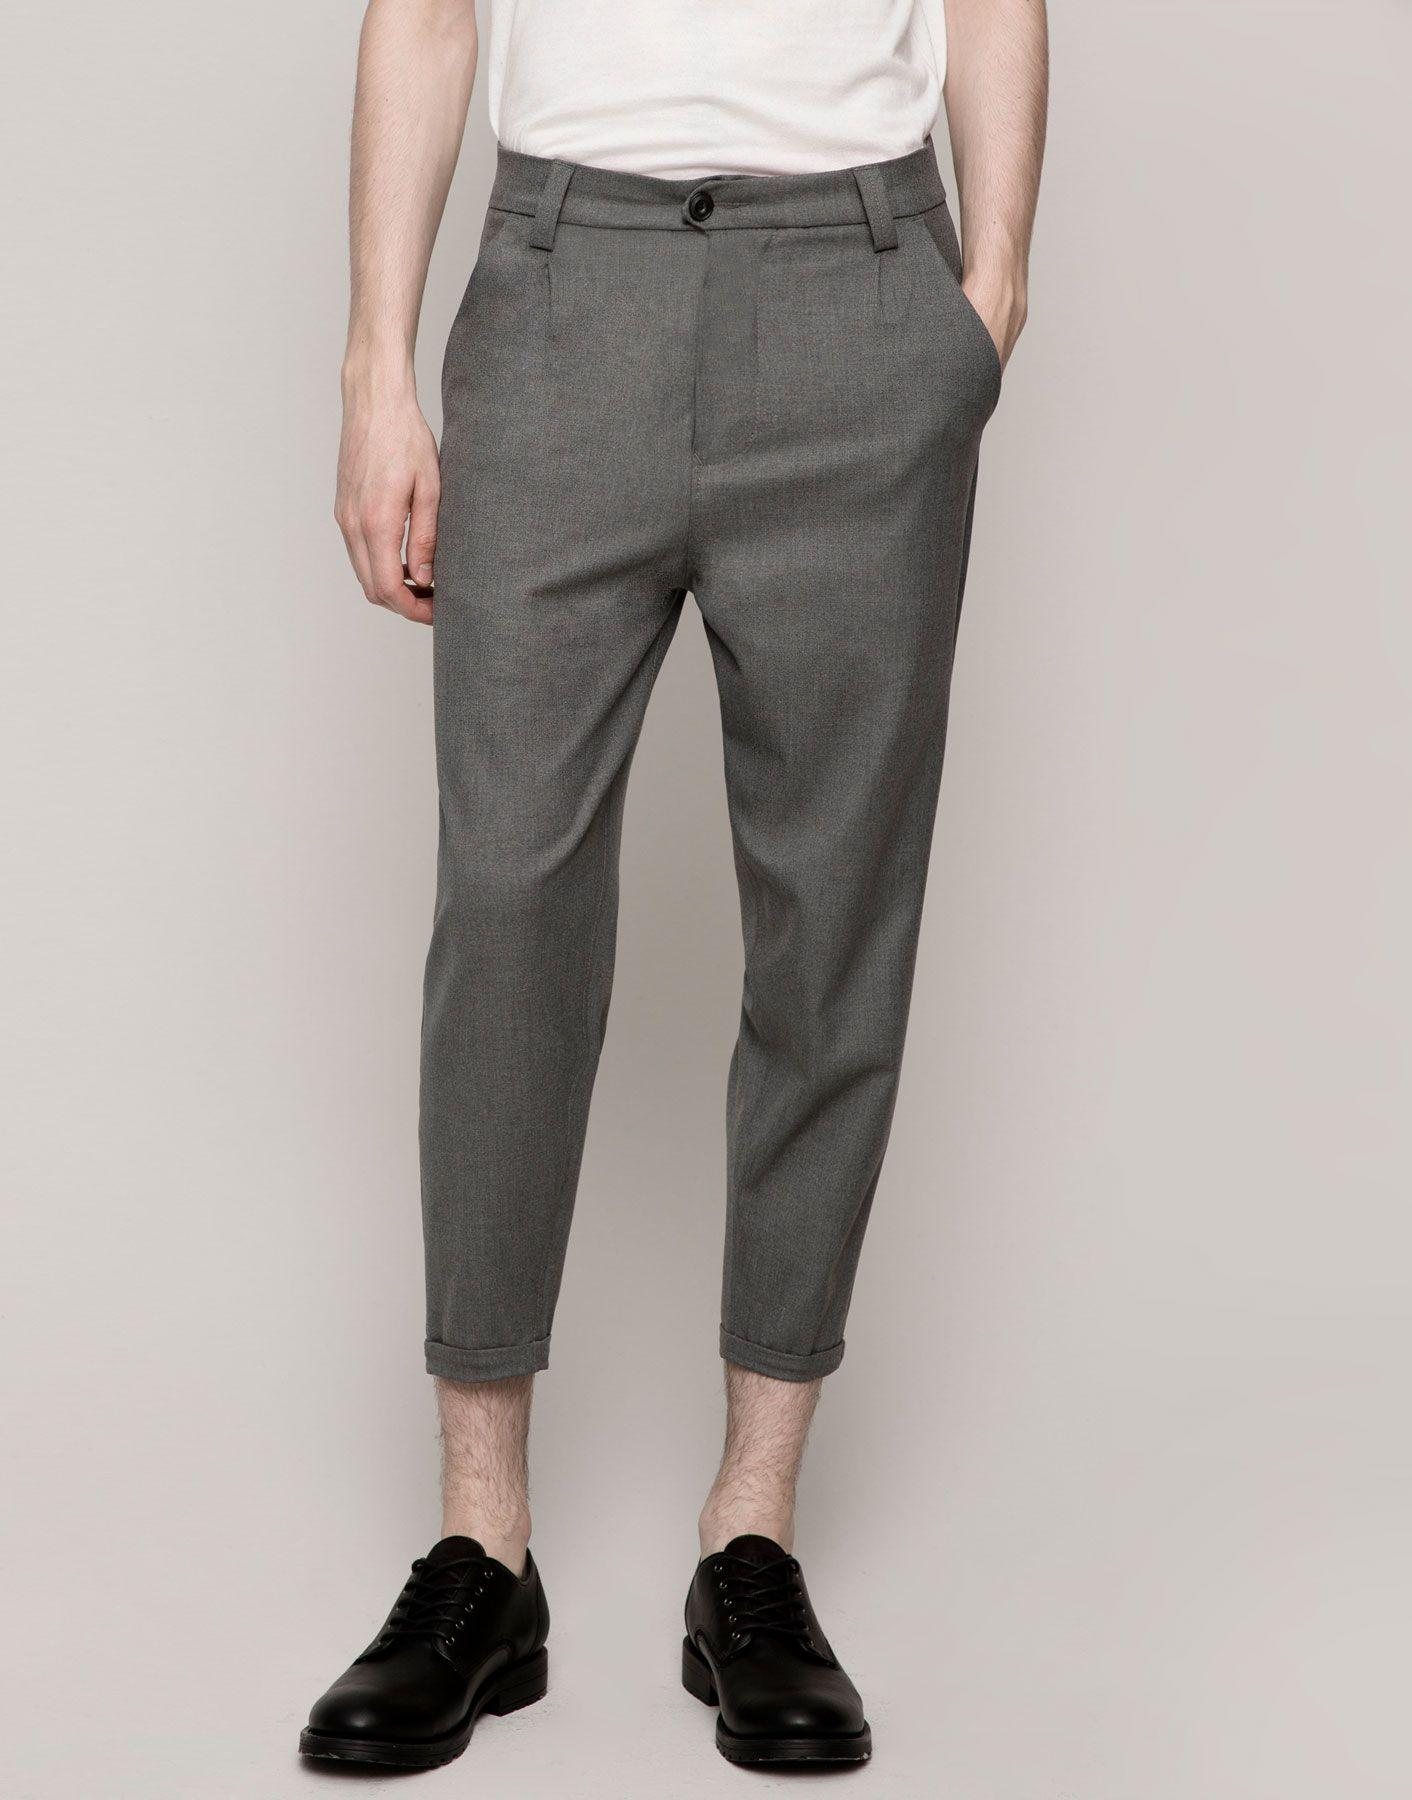 Pantalon Tipo Chino Vestir Jeans Hombre Pull Bear Espana Ropa De Hombre Pantalones De Vestir Hombre Pantalones De Hombre Moda